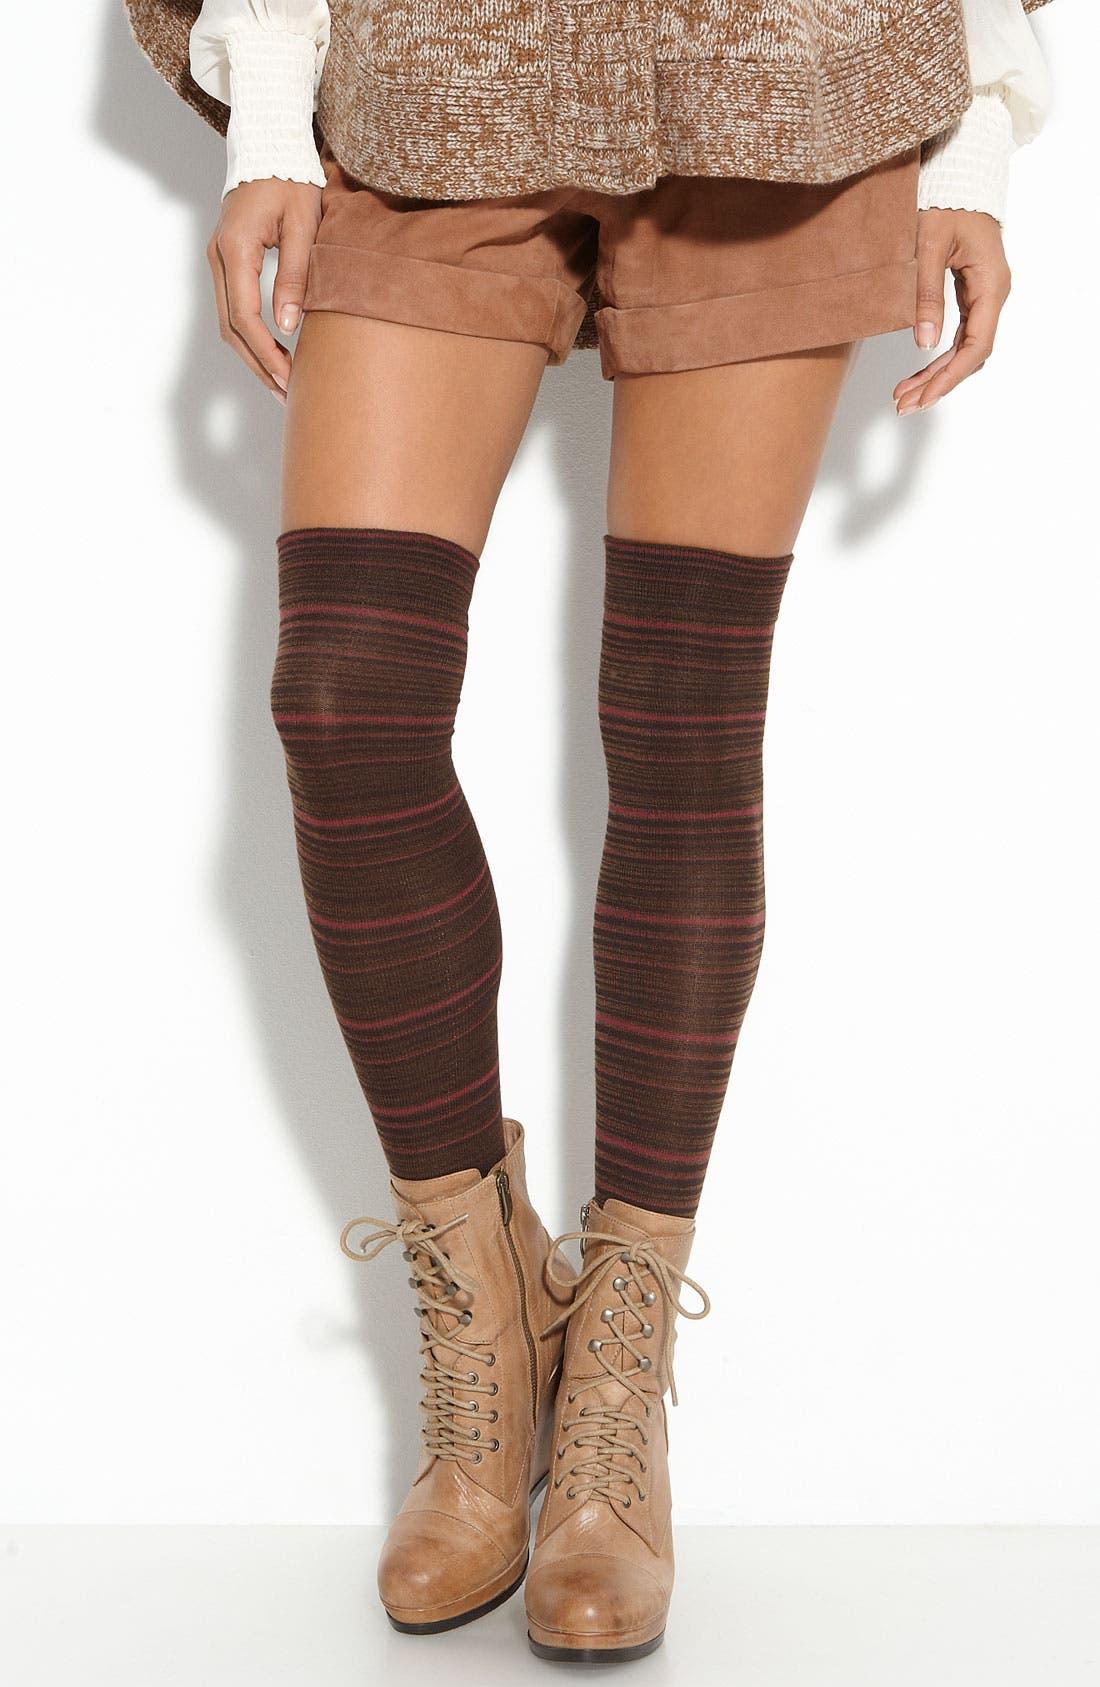 Alternate Image 1 Selected - Nordstrom Mini Stripe Over the Knee Socks